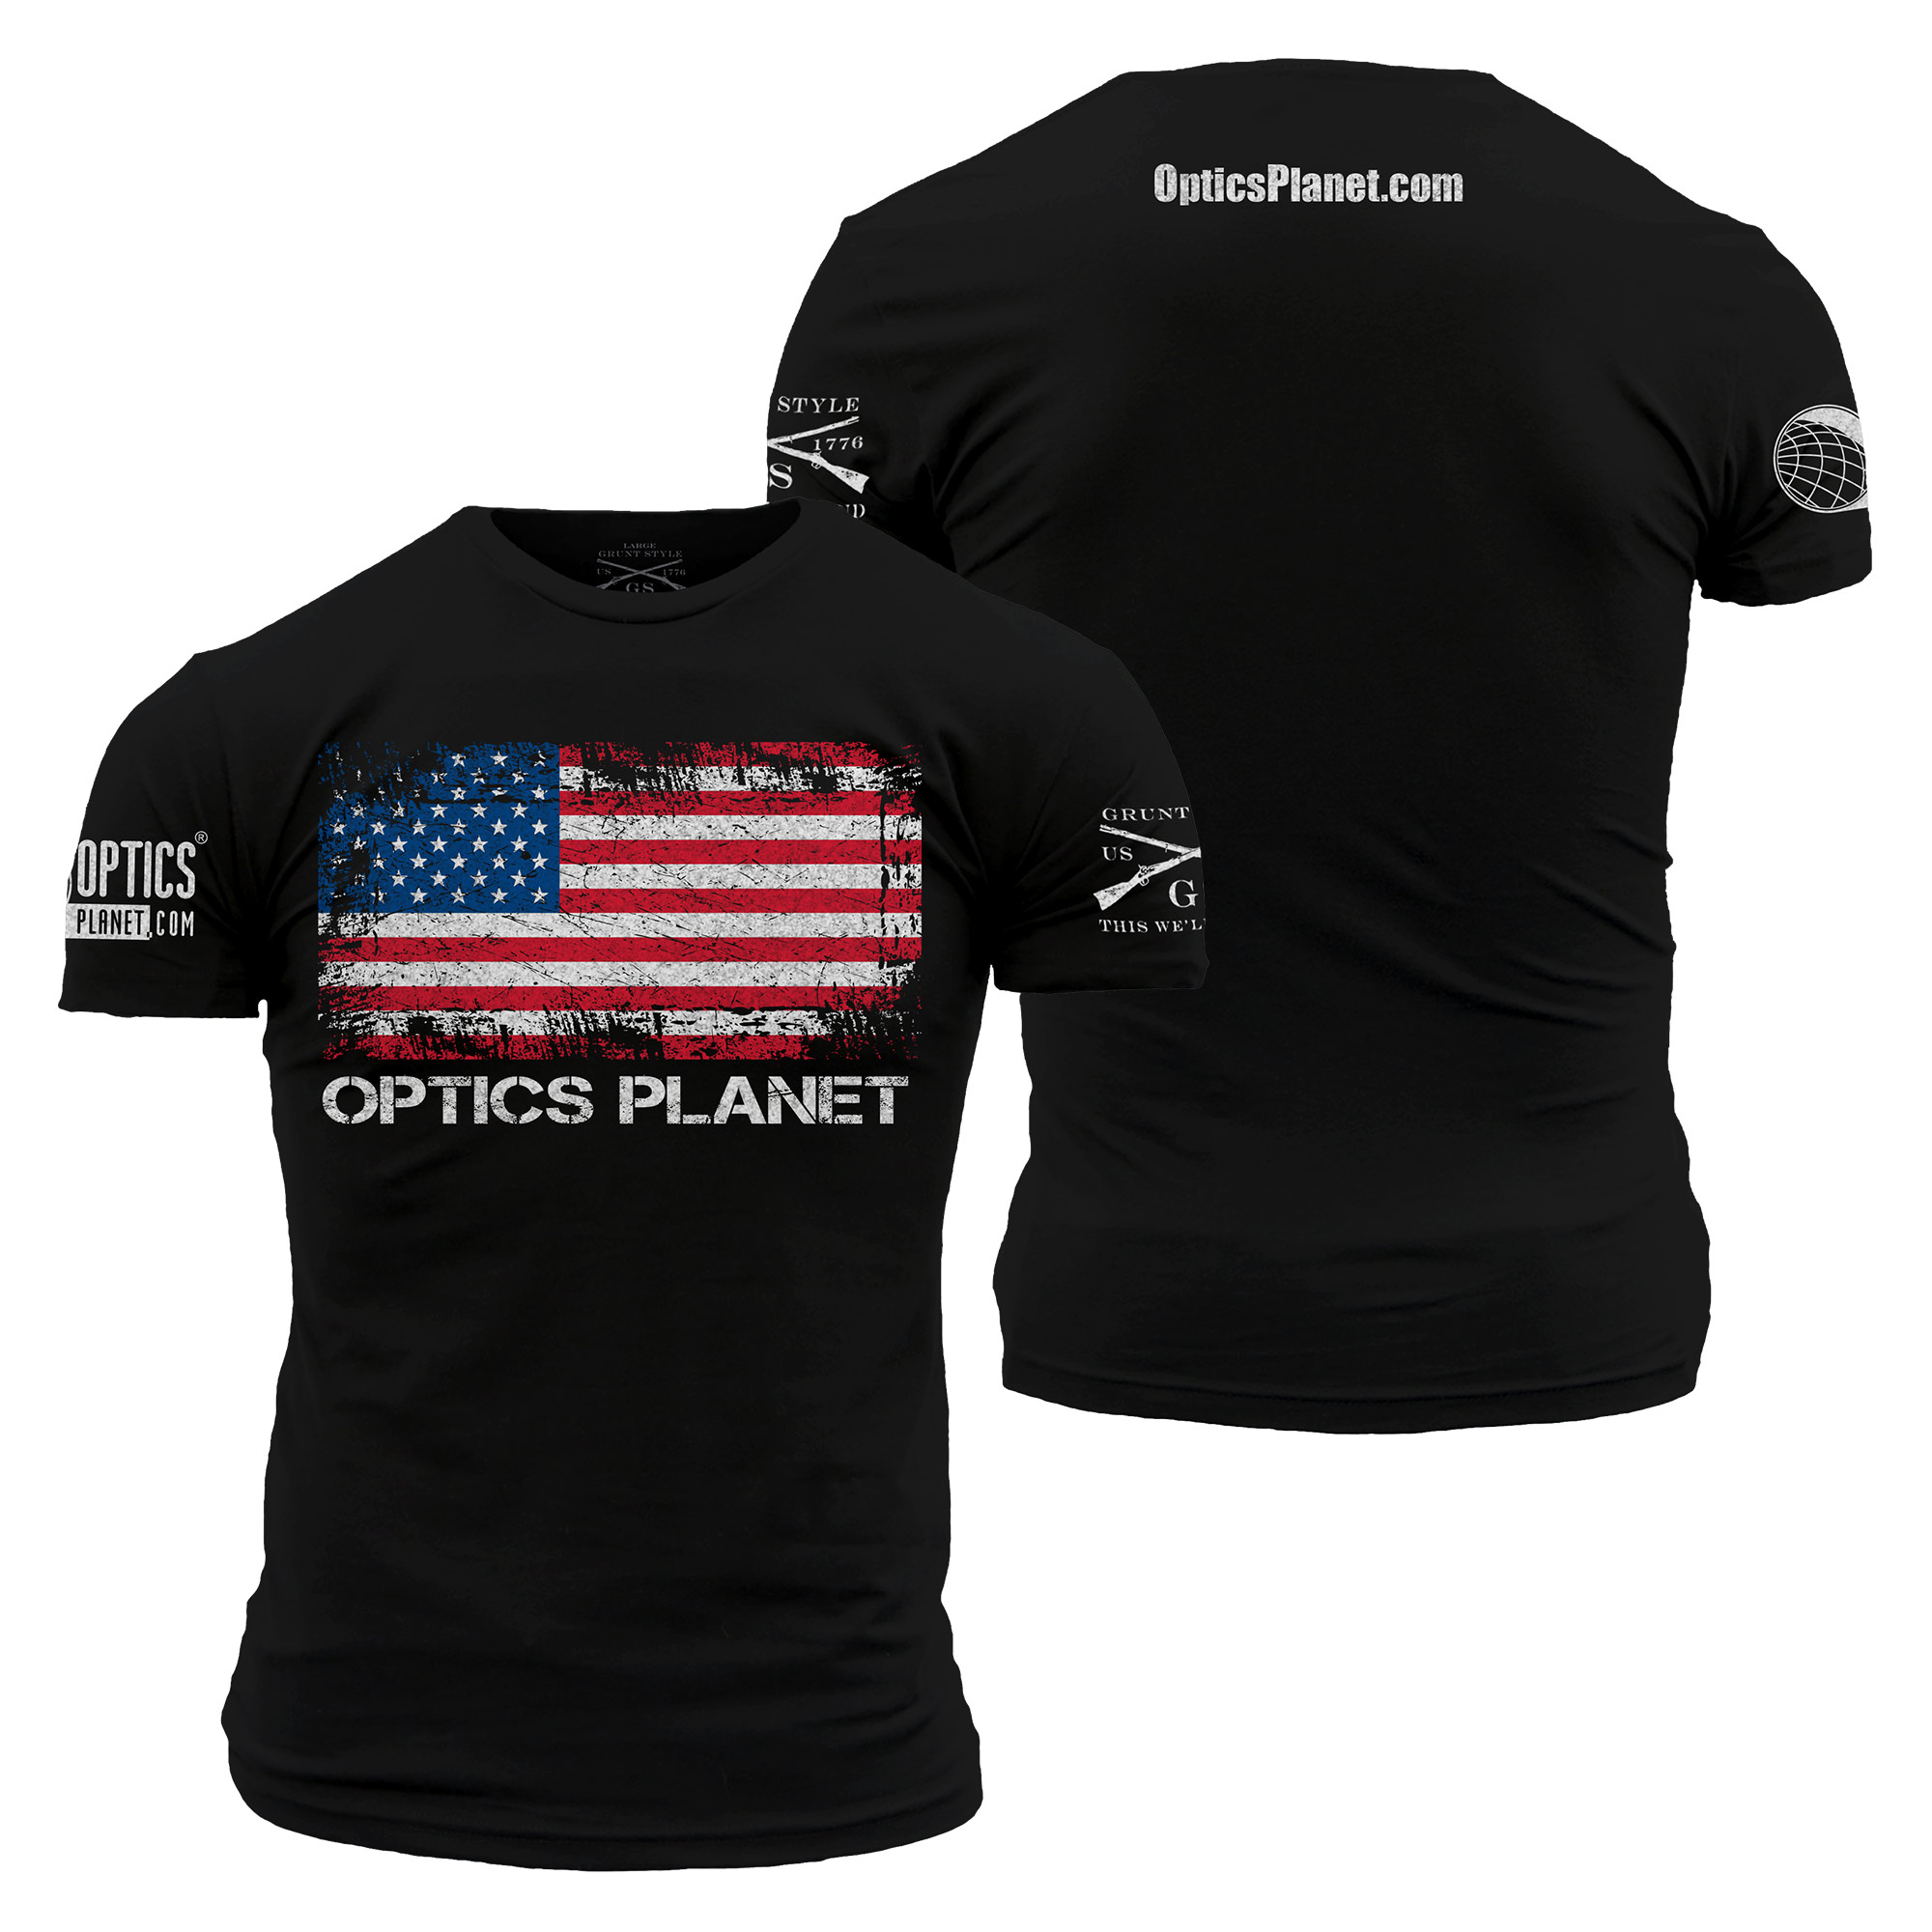 Opticsplanet Men S Exclusive Grunt Style American Flag T Shirt Up